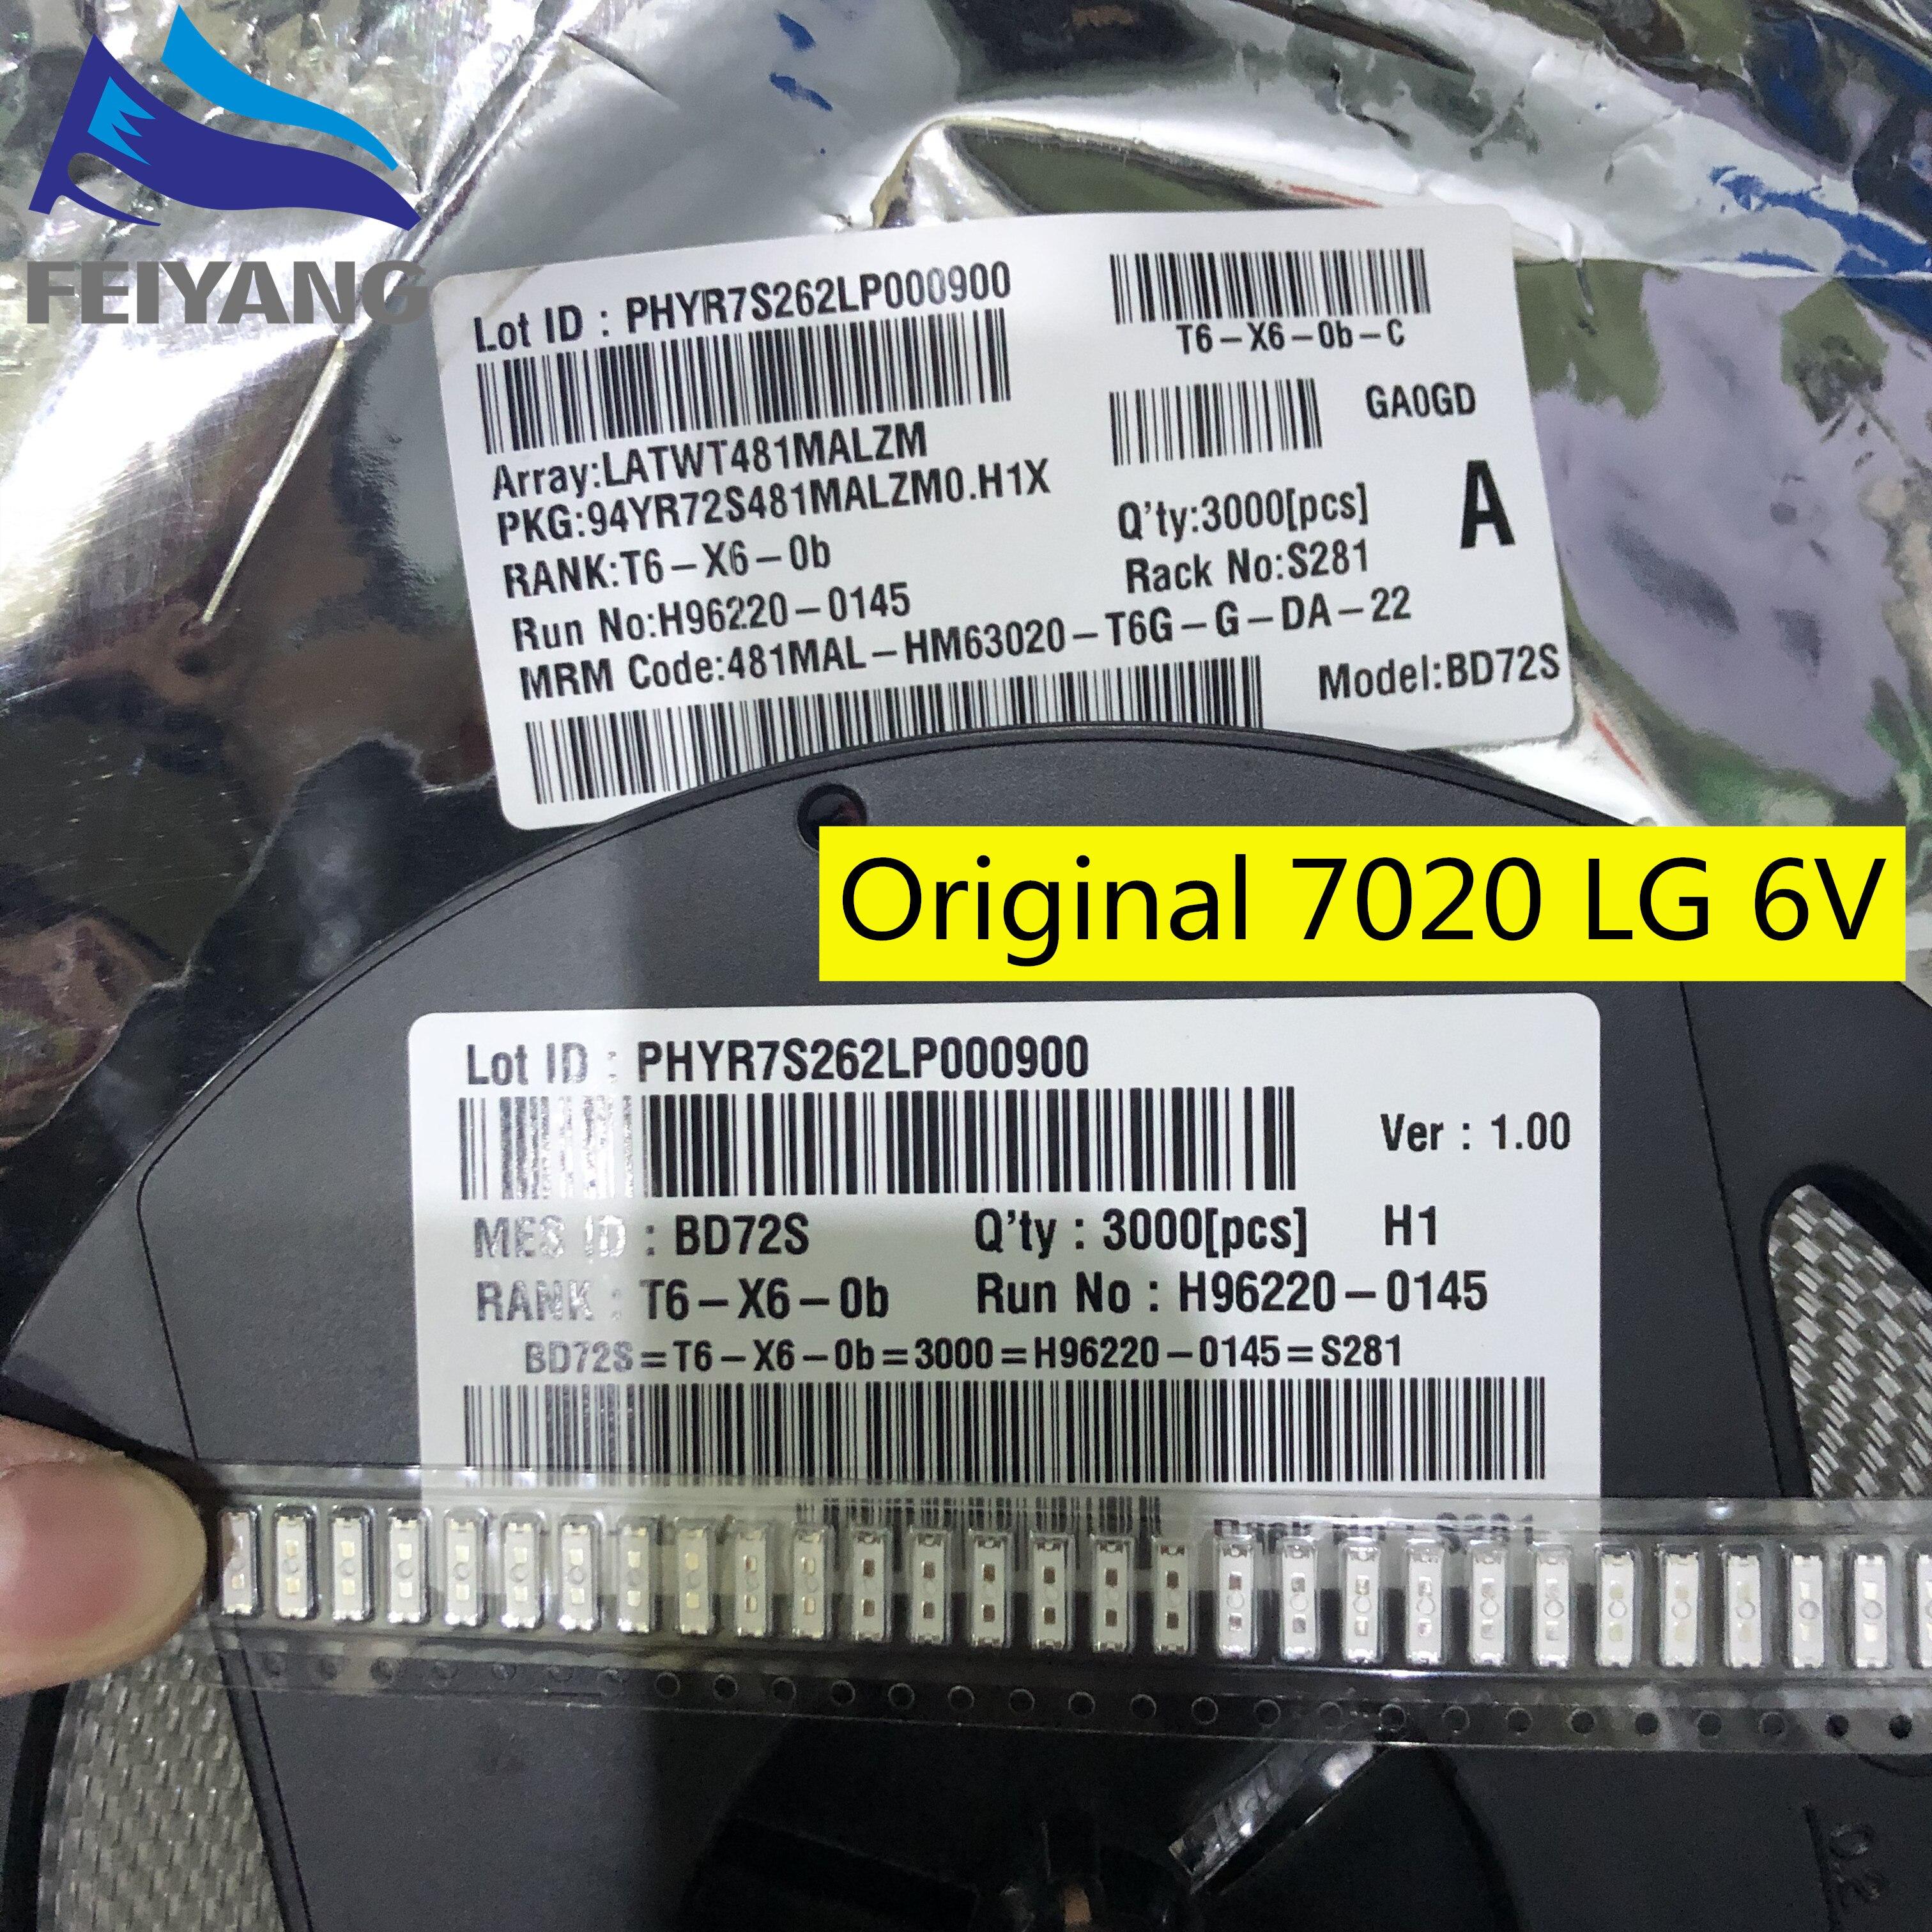 LED especial-2 de 1000 Uds. Para LG, retroiluminación LCD APLICACIÓN DE TV LED de 1W 6V 7020 blanco frío, retroiluminación de TV LCD, aplicación de TV BD72S/BD72C